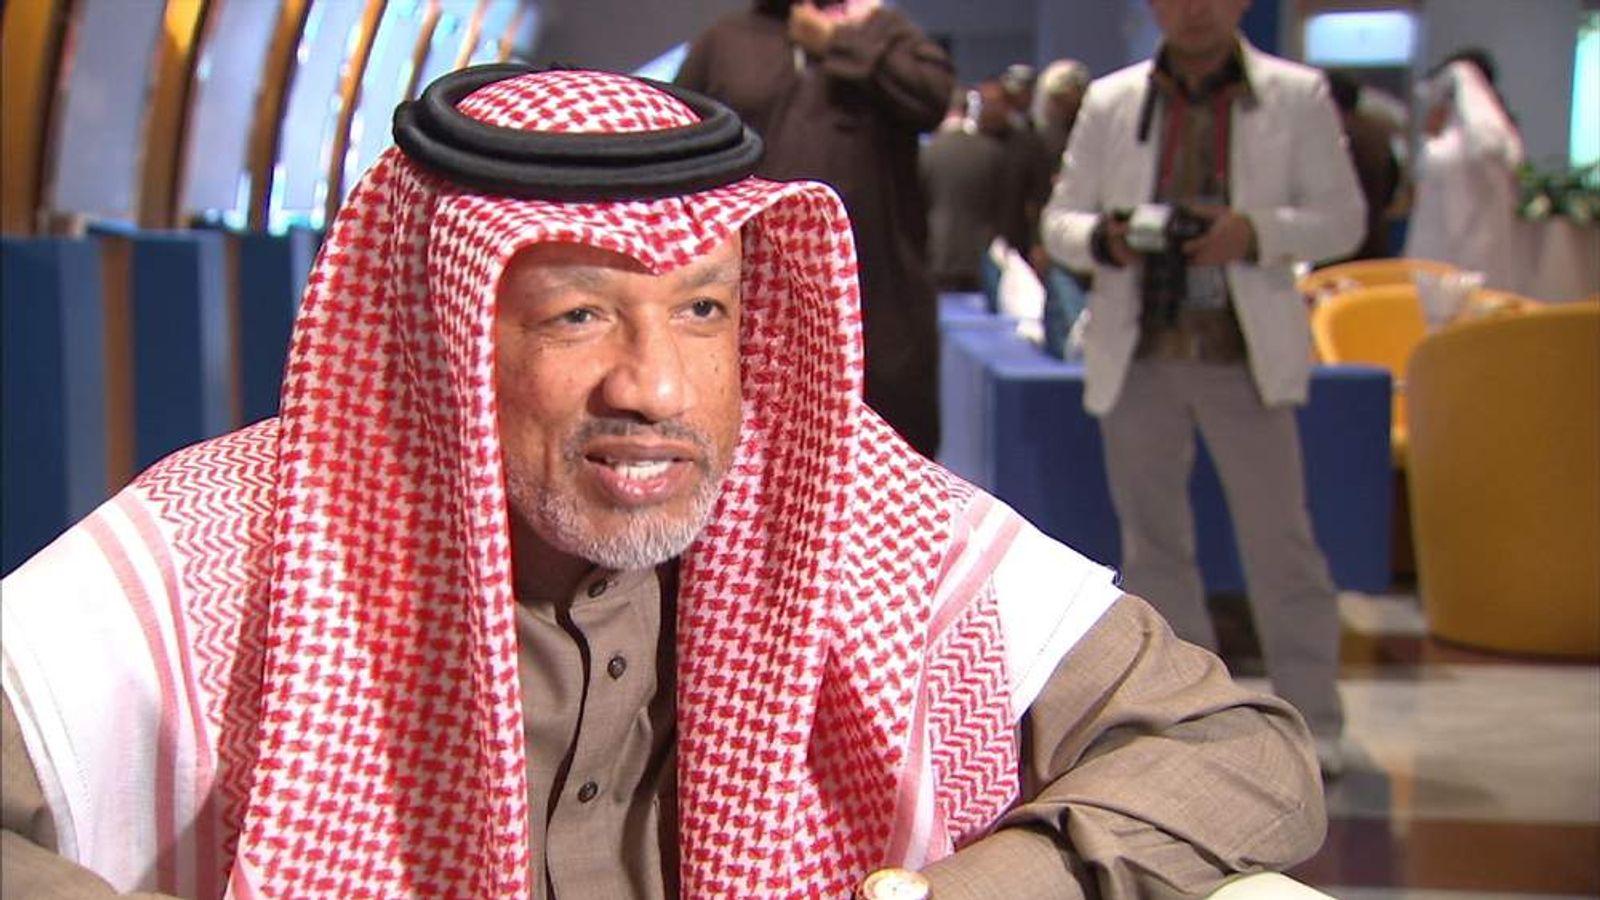 Mohammed Bin Hammam.